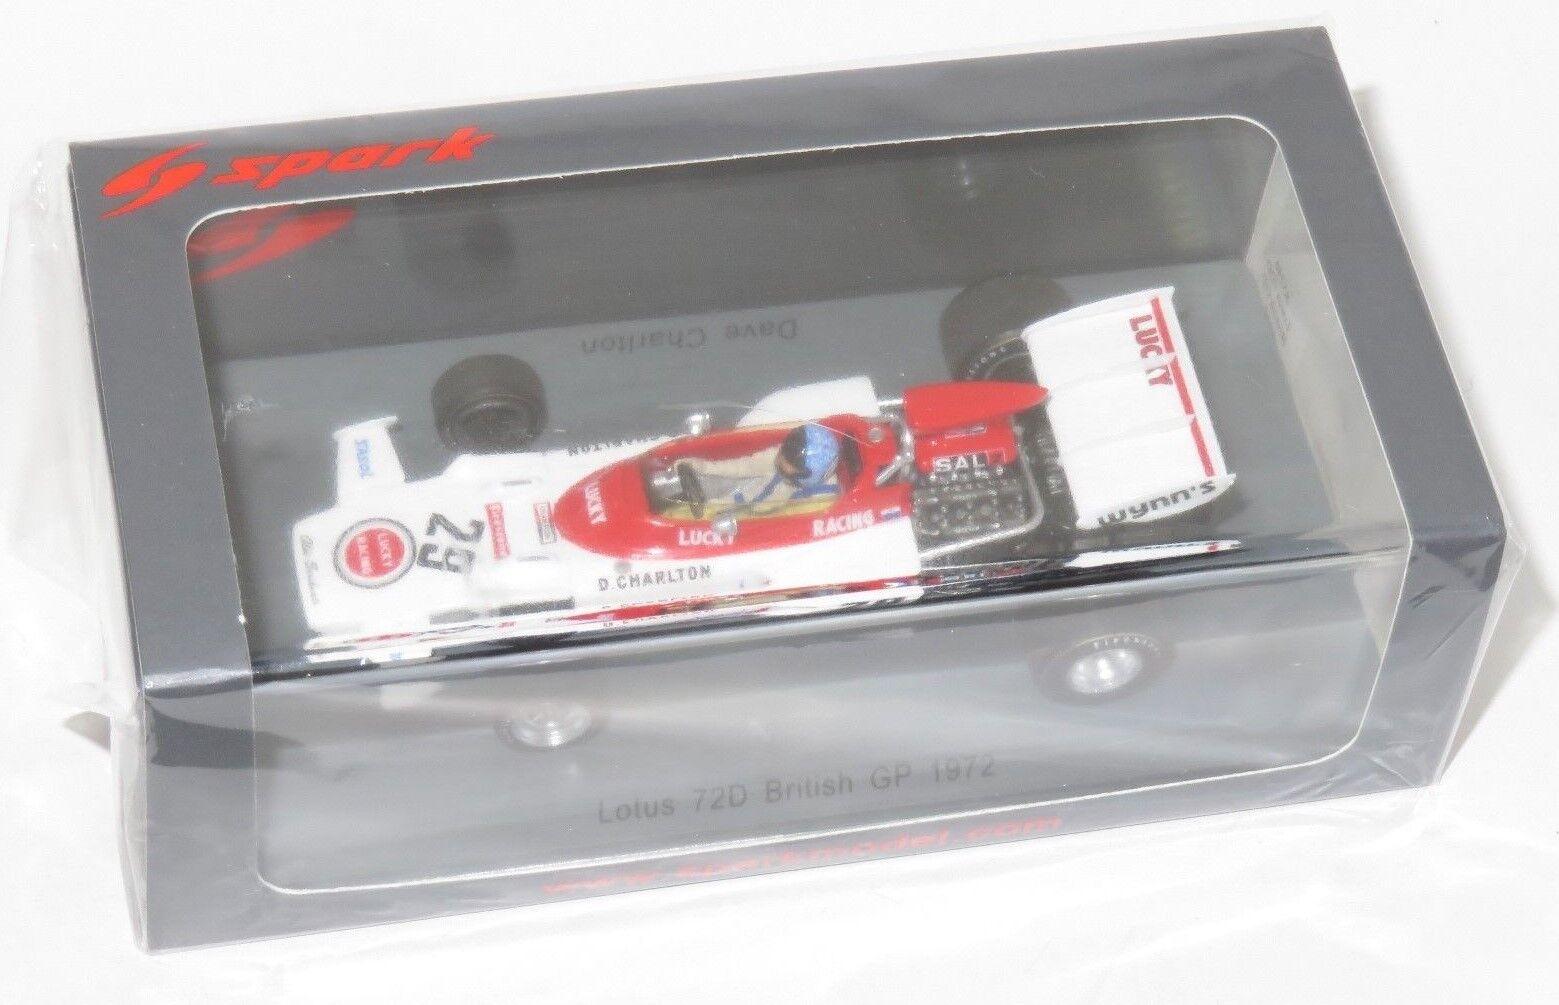 SPARK MODEL LOTUS 72D British GP 1972  29 Dave CHARLTON